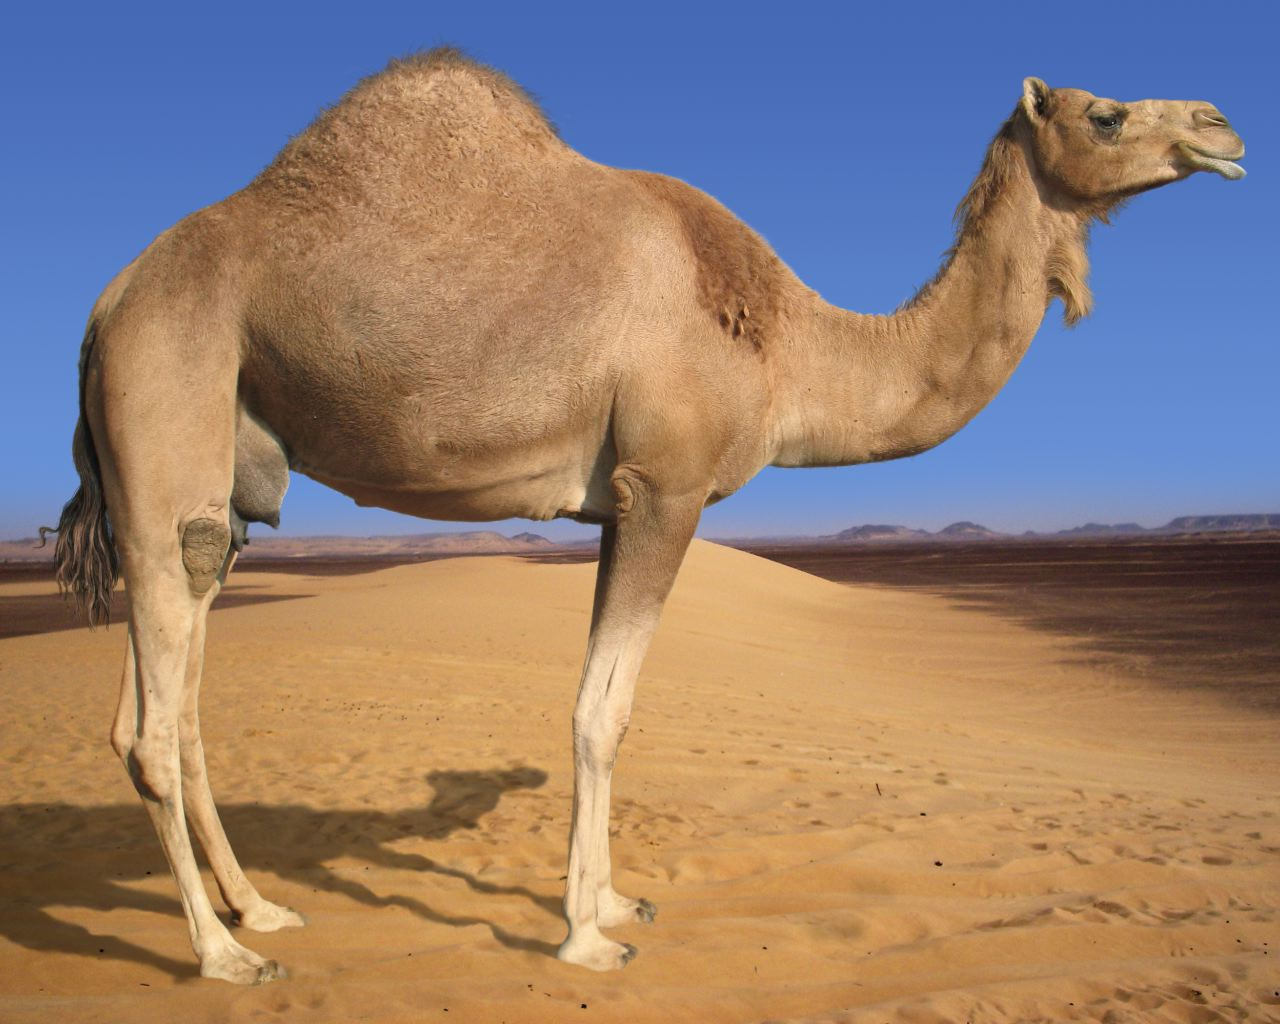 Ethiopian Camel Cheese